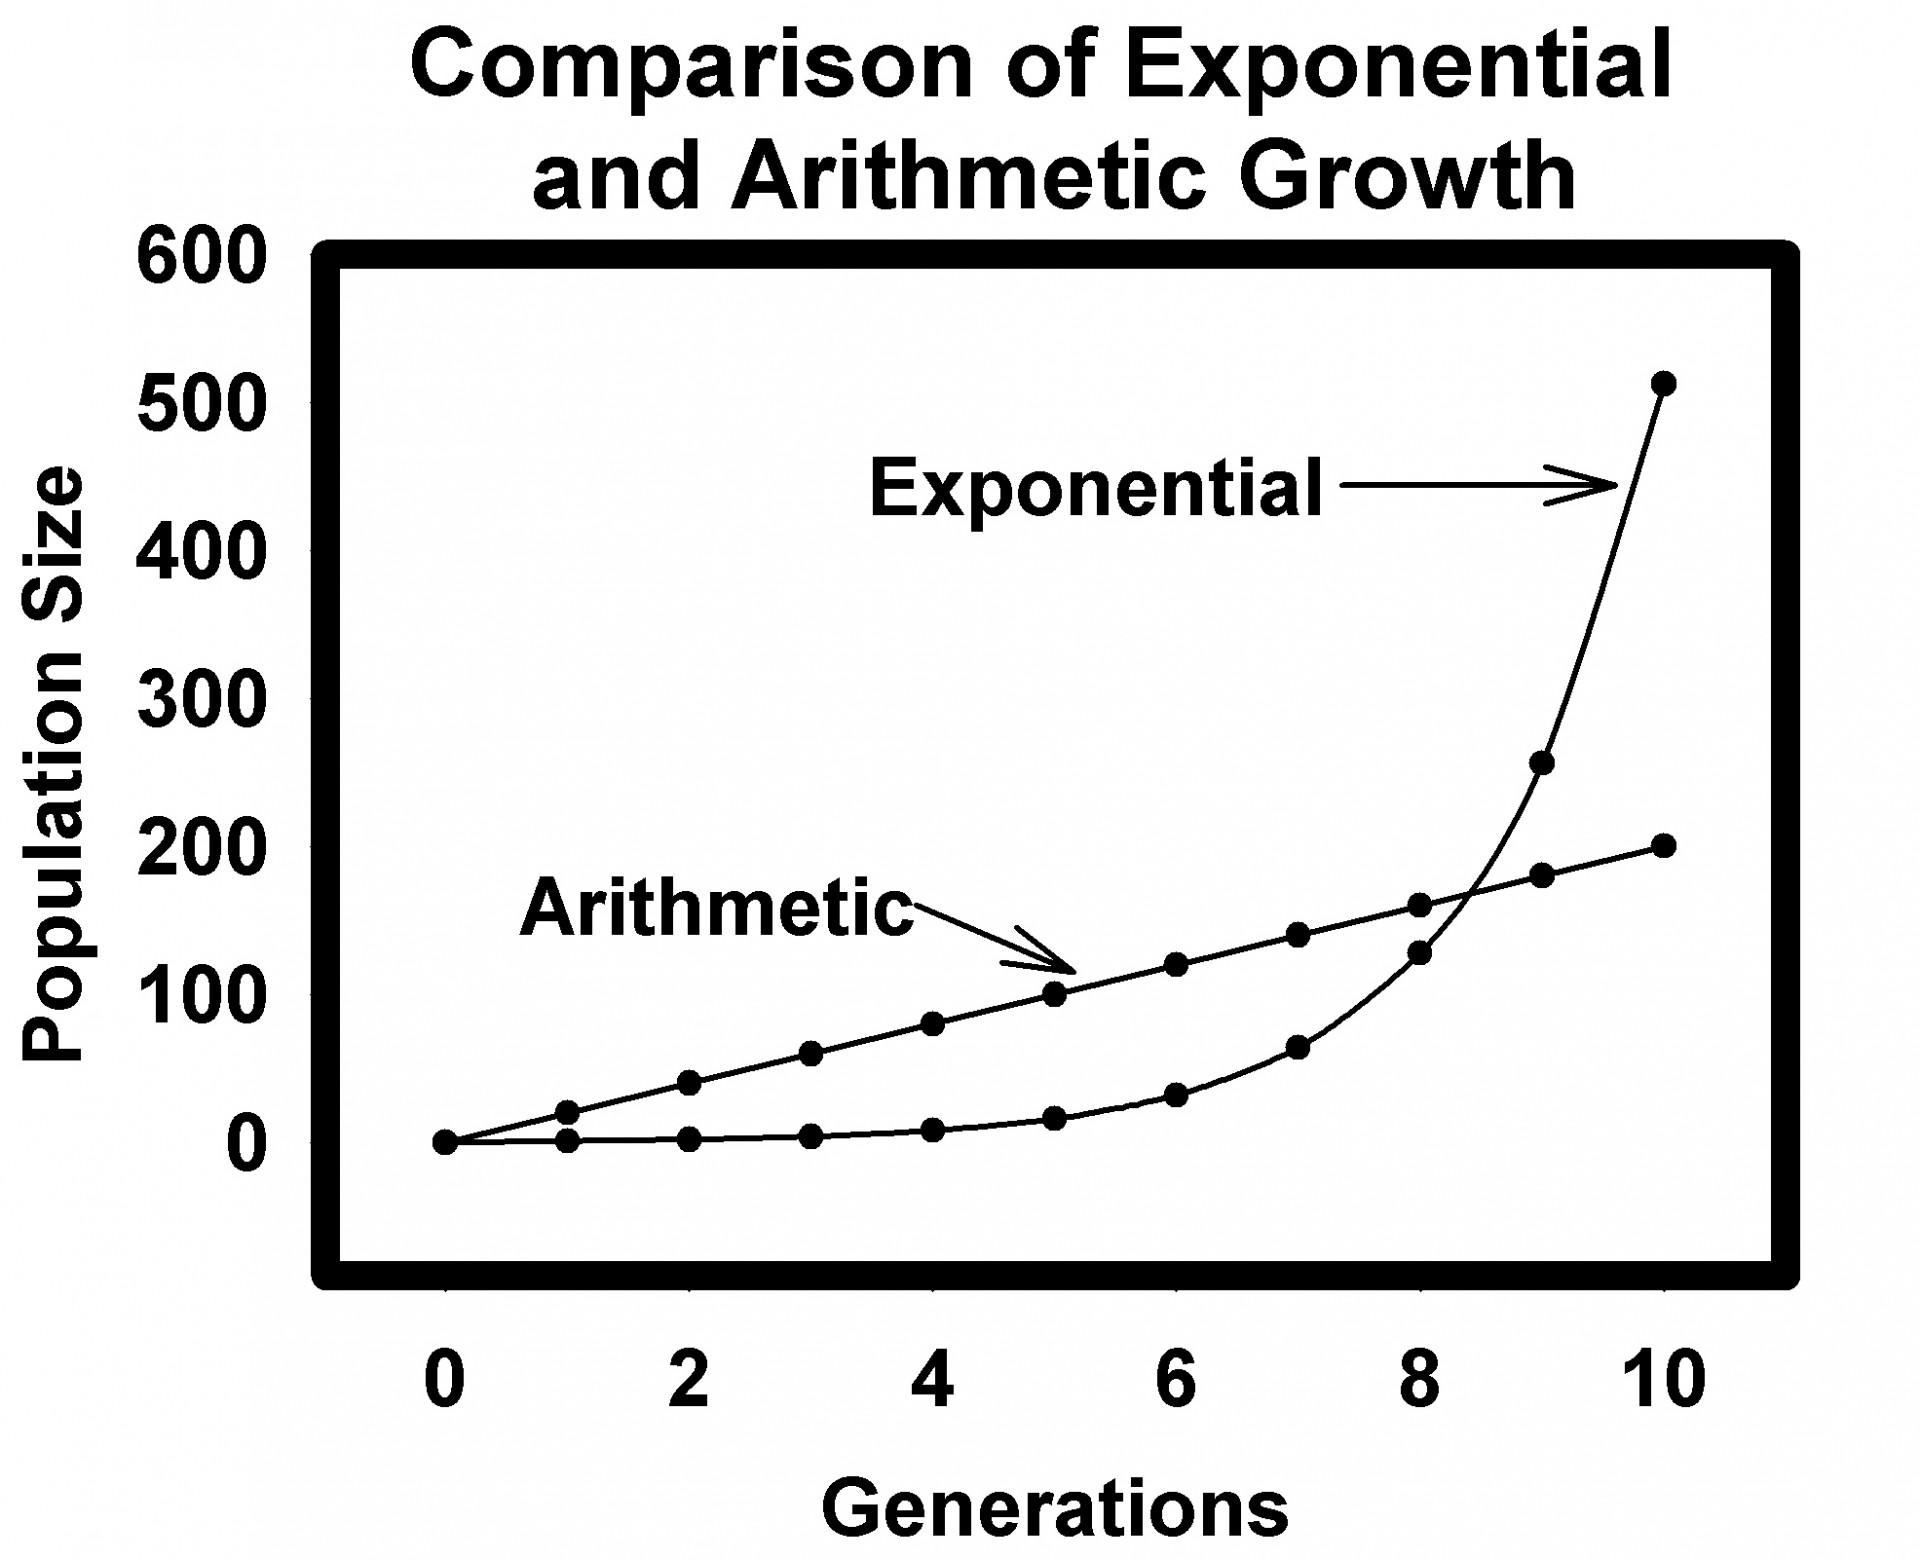 005 Malthusgrowthcurves Jpg Essay Example On The Principle Of Singular Population Pdf By Thomas Malthus Main Idea 1920